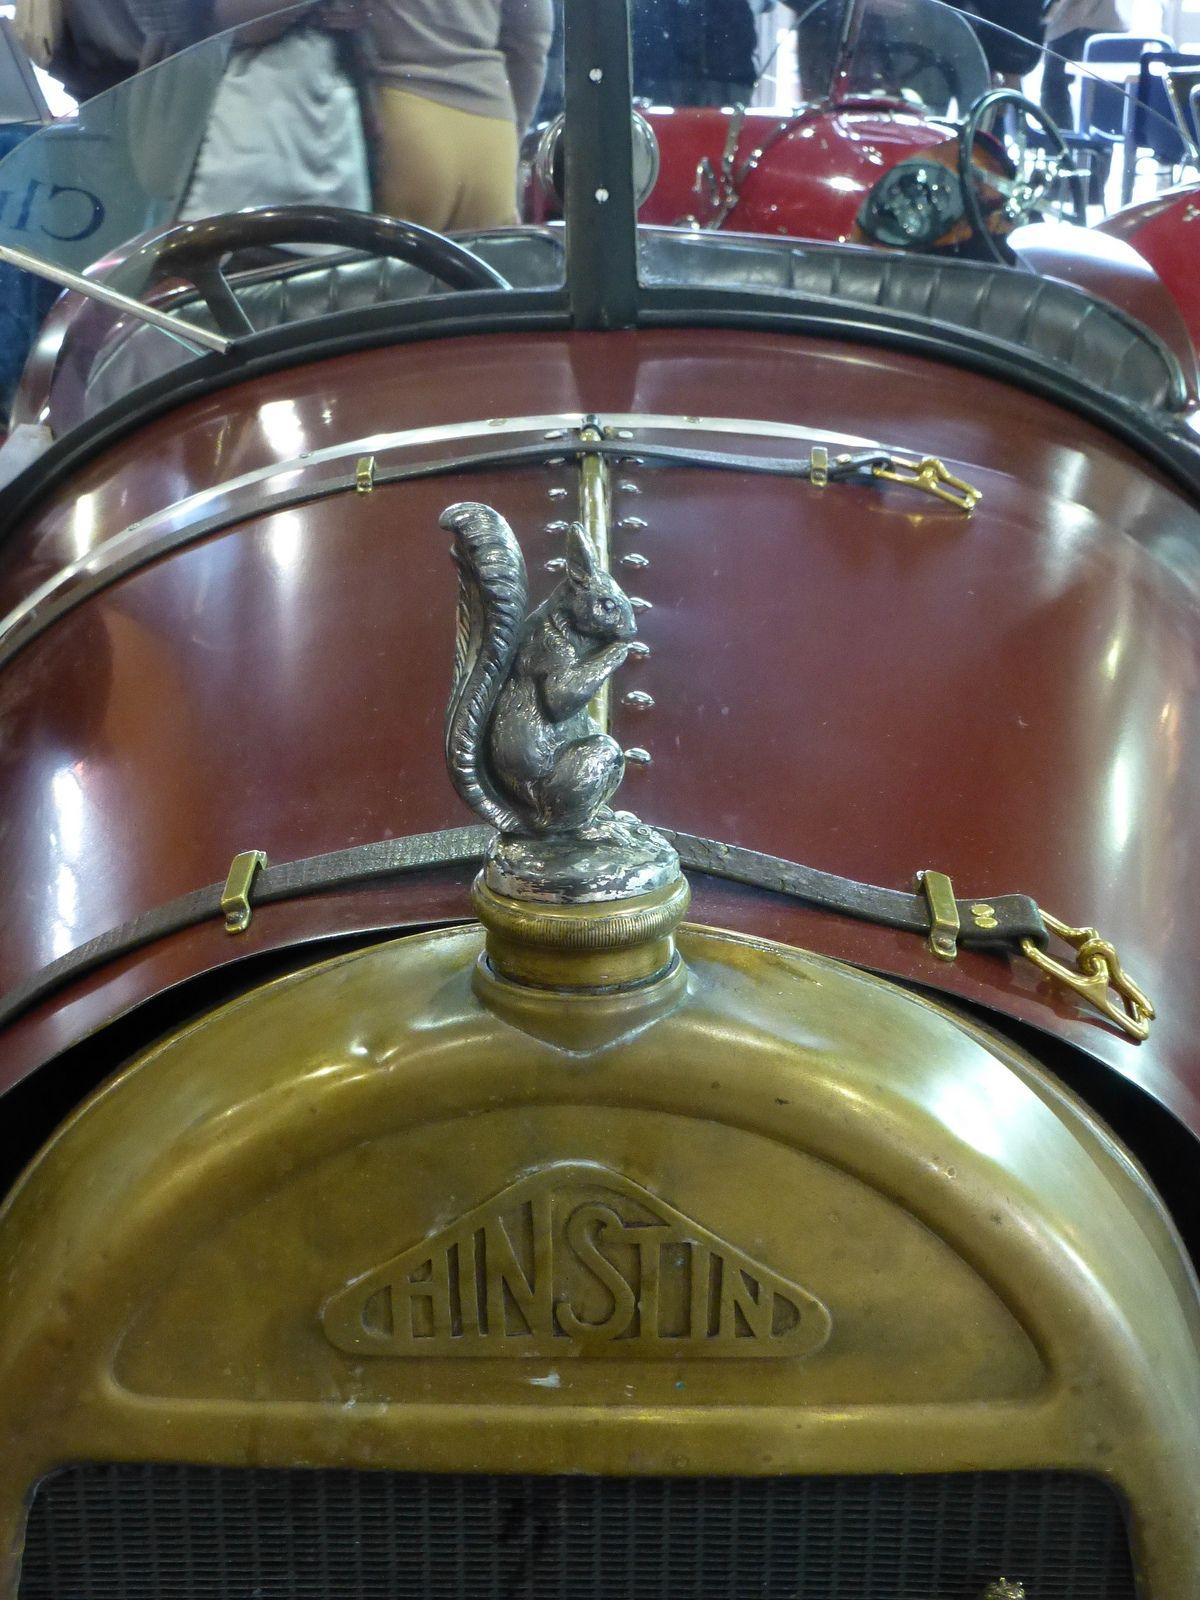 1920 Hinstin Cyclecar - hood ornament